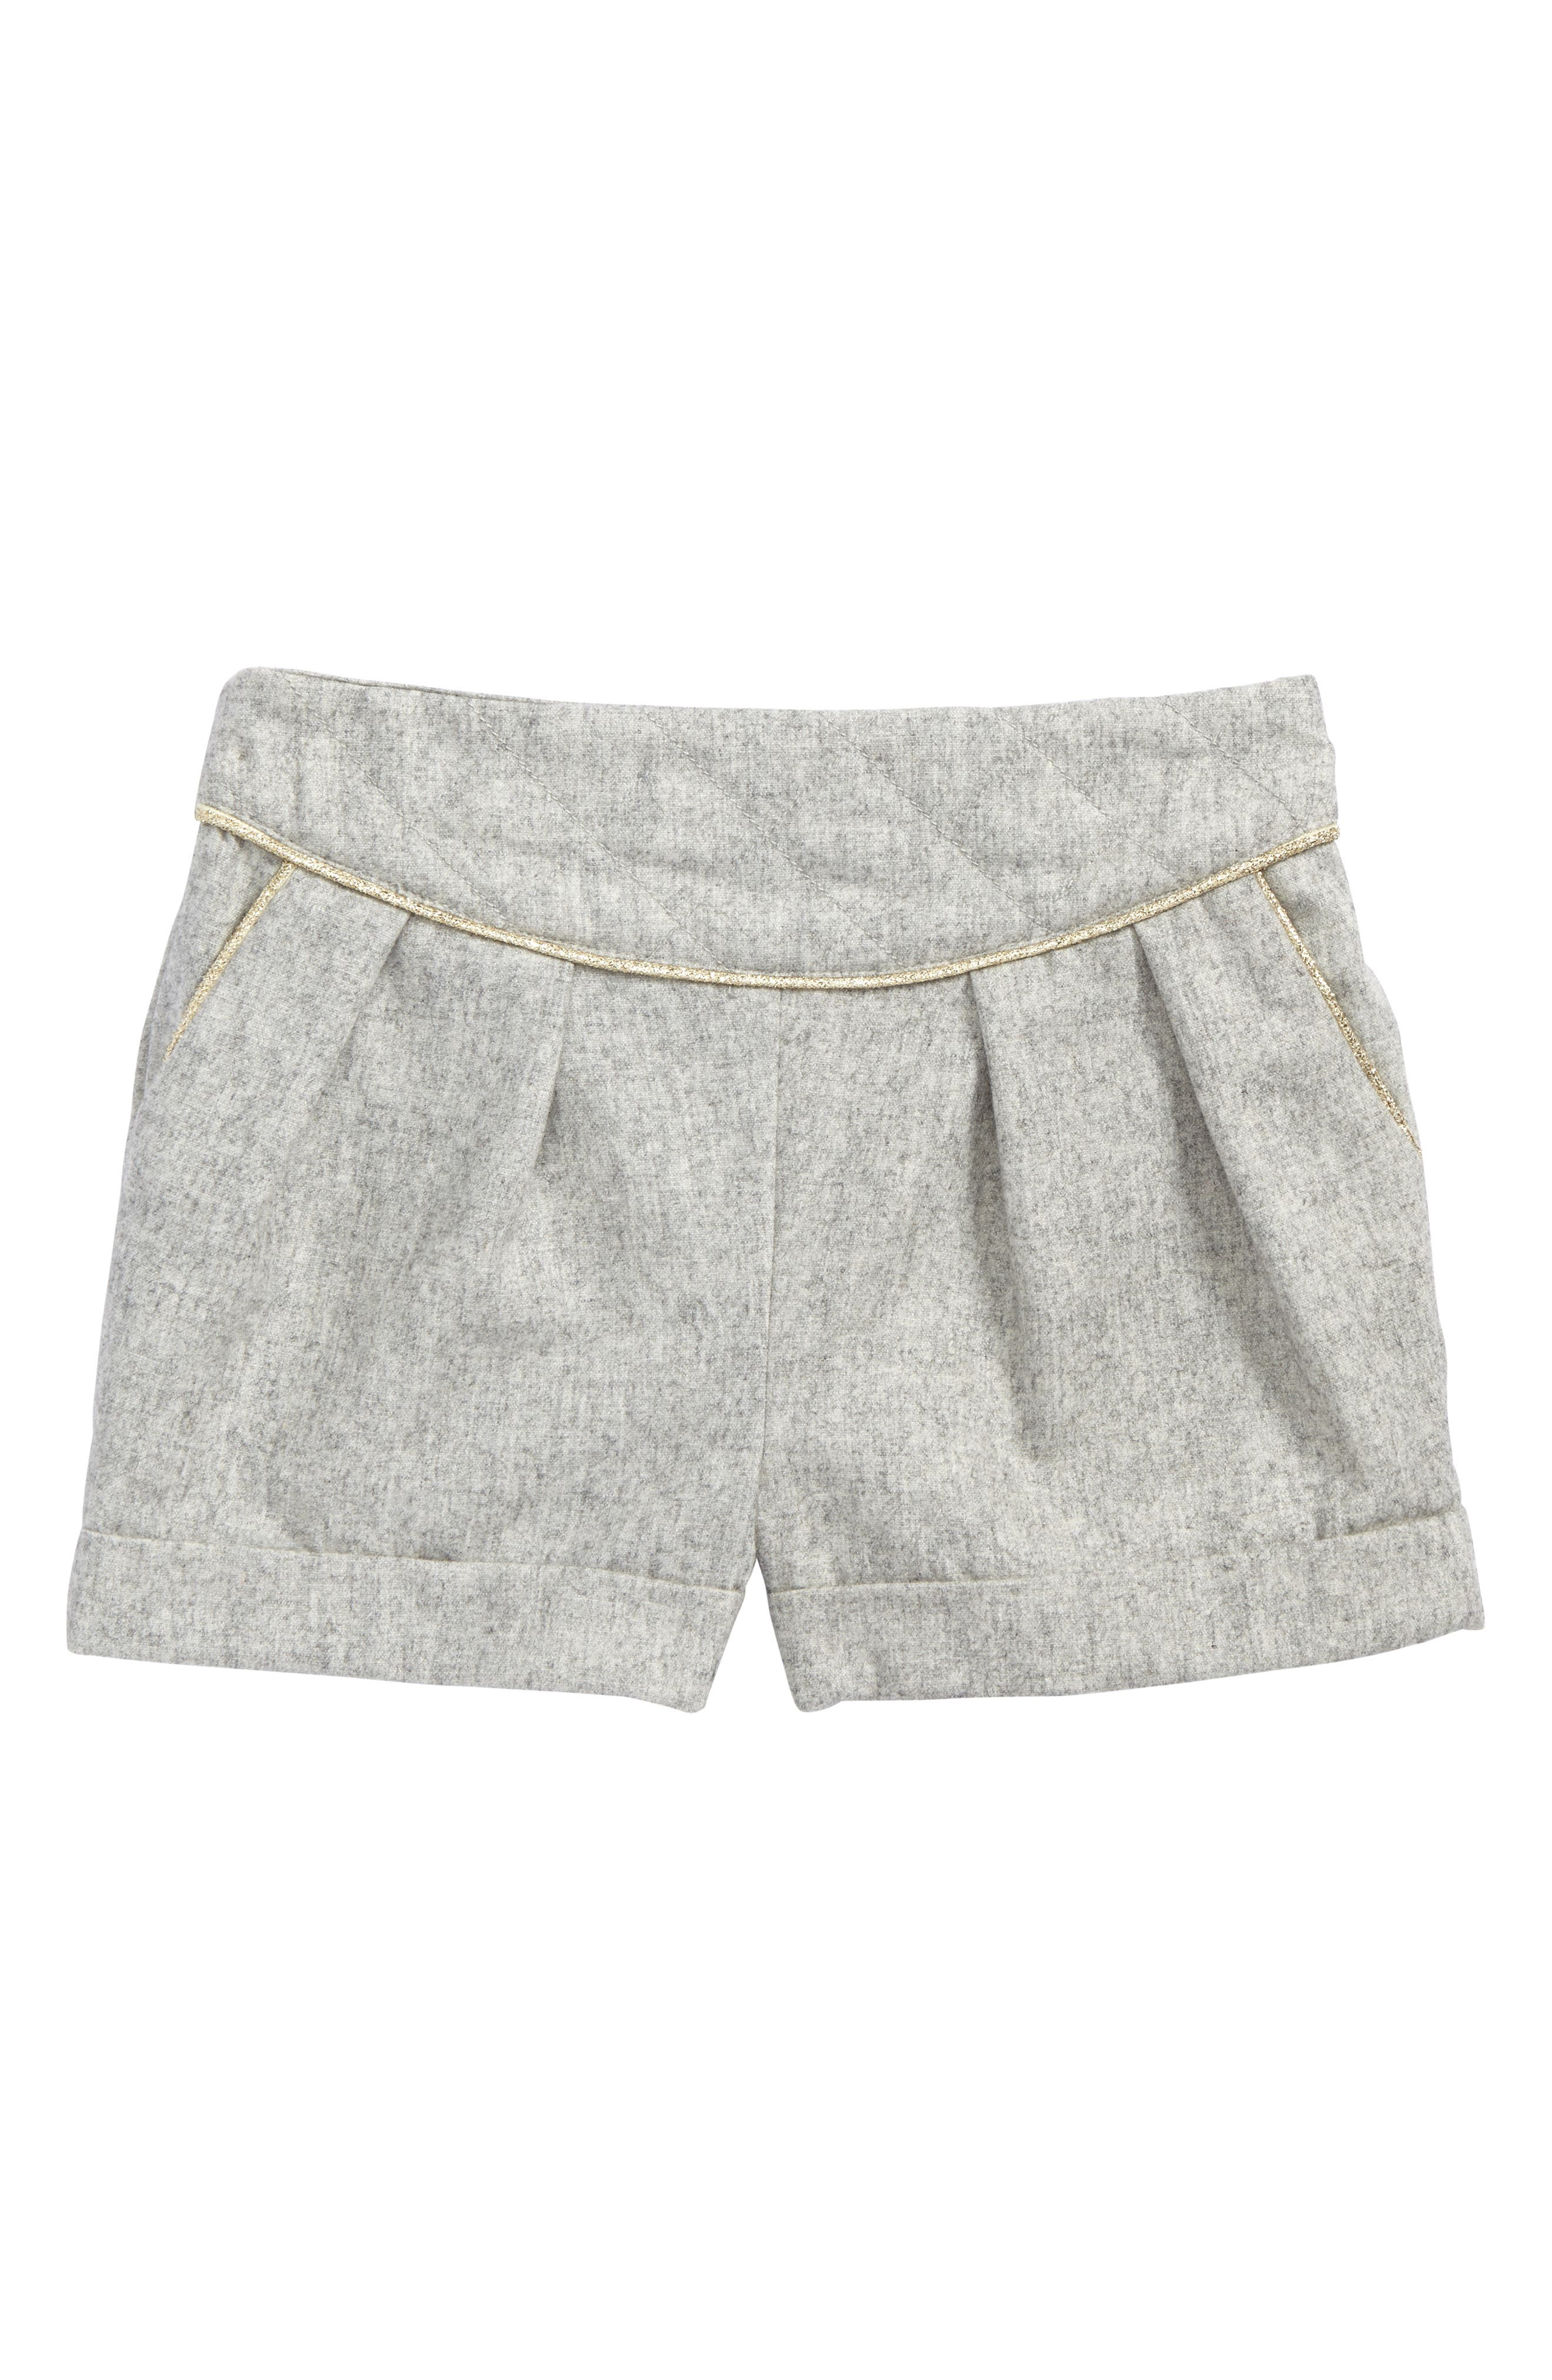 Diamond Shorts,                             Main thumbnail 1, color,                             050